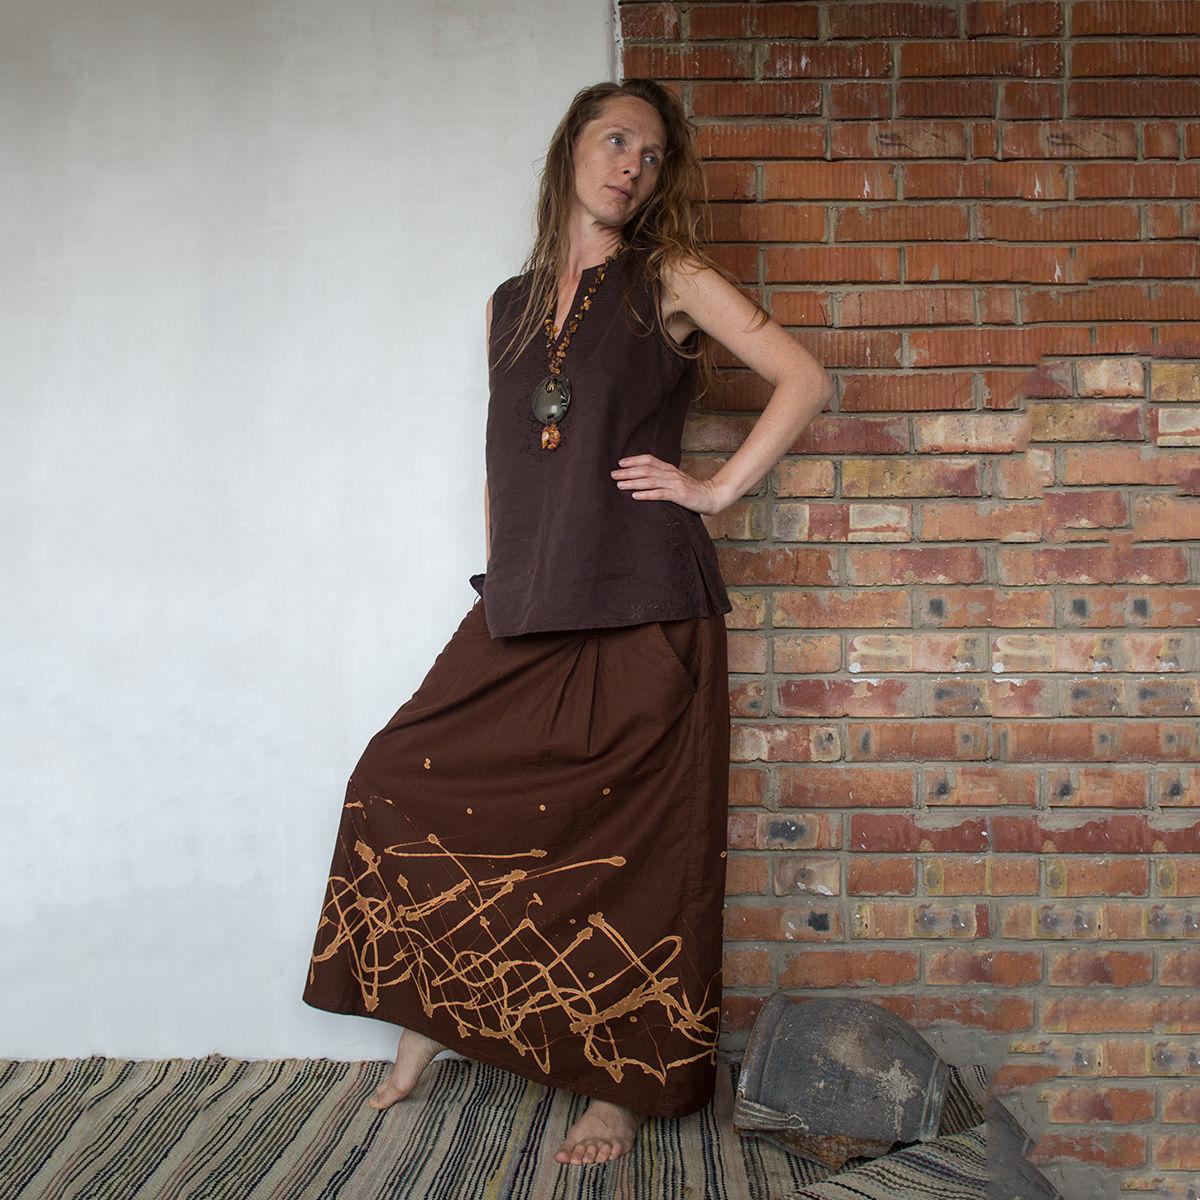 MarlЁn юбка Шоколад с молоком